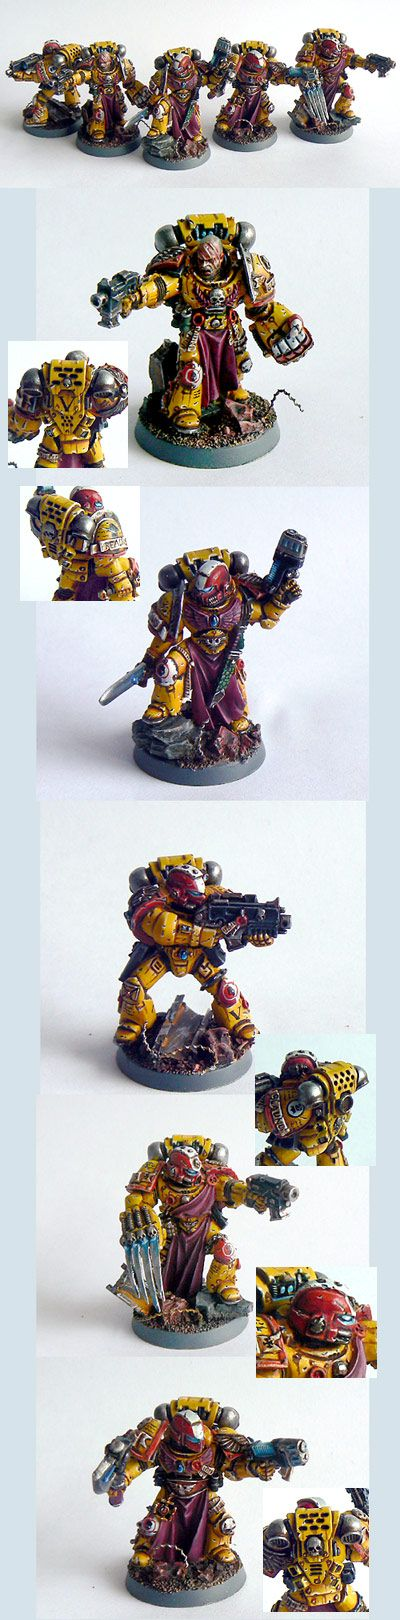 Imperial Fists Veteran squad